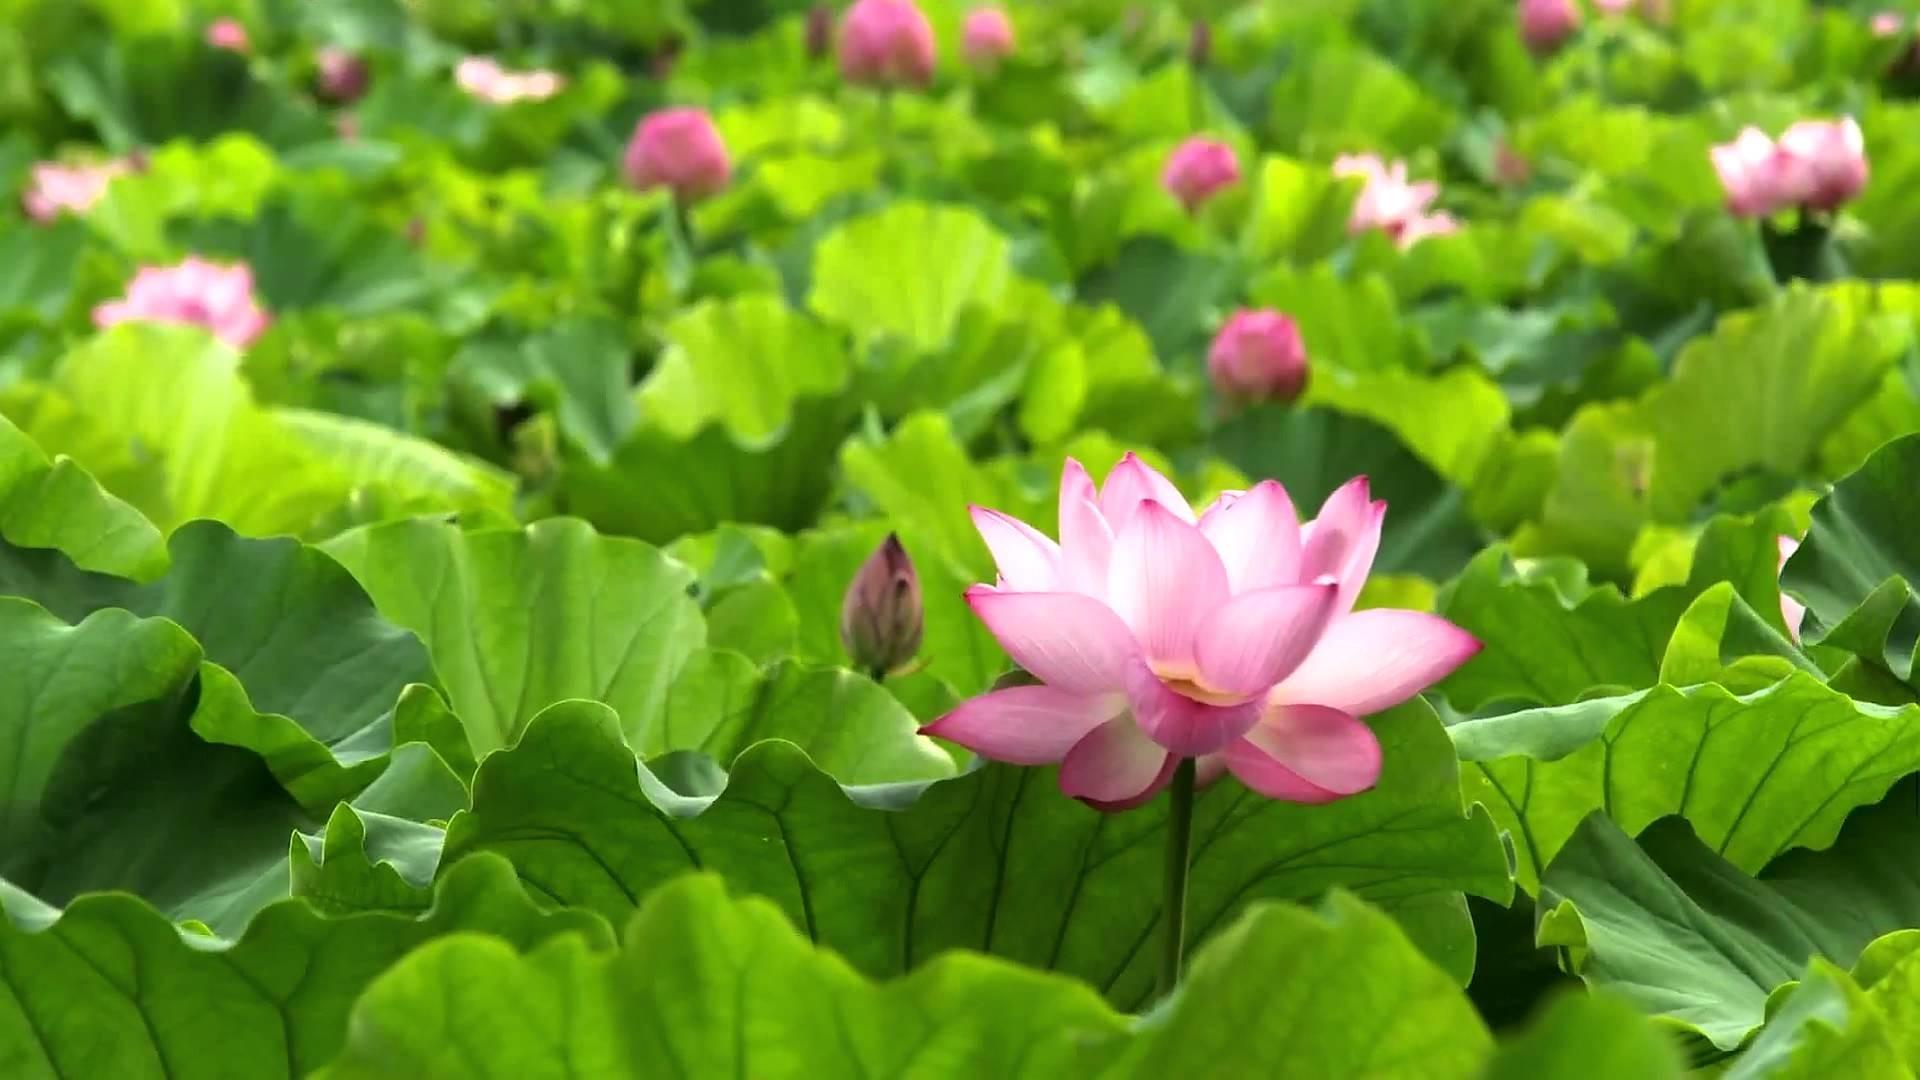 Buddha Hd Wallpaper 1080p Lotus Flower Background 54 Images